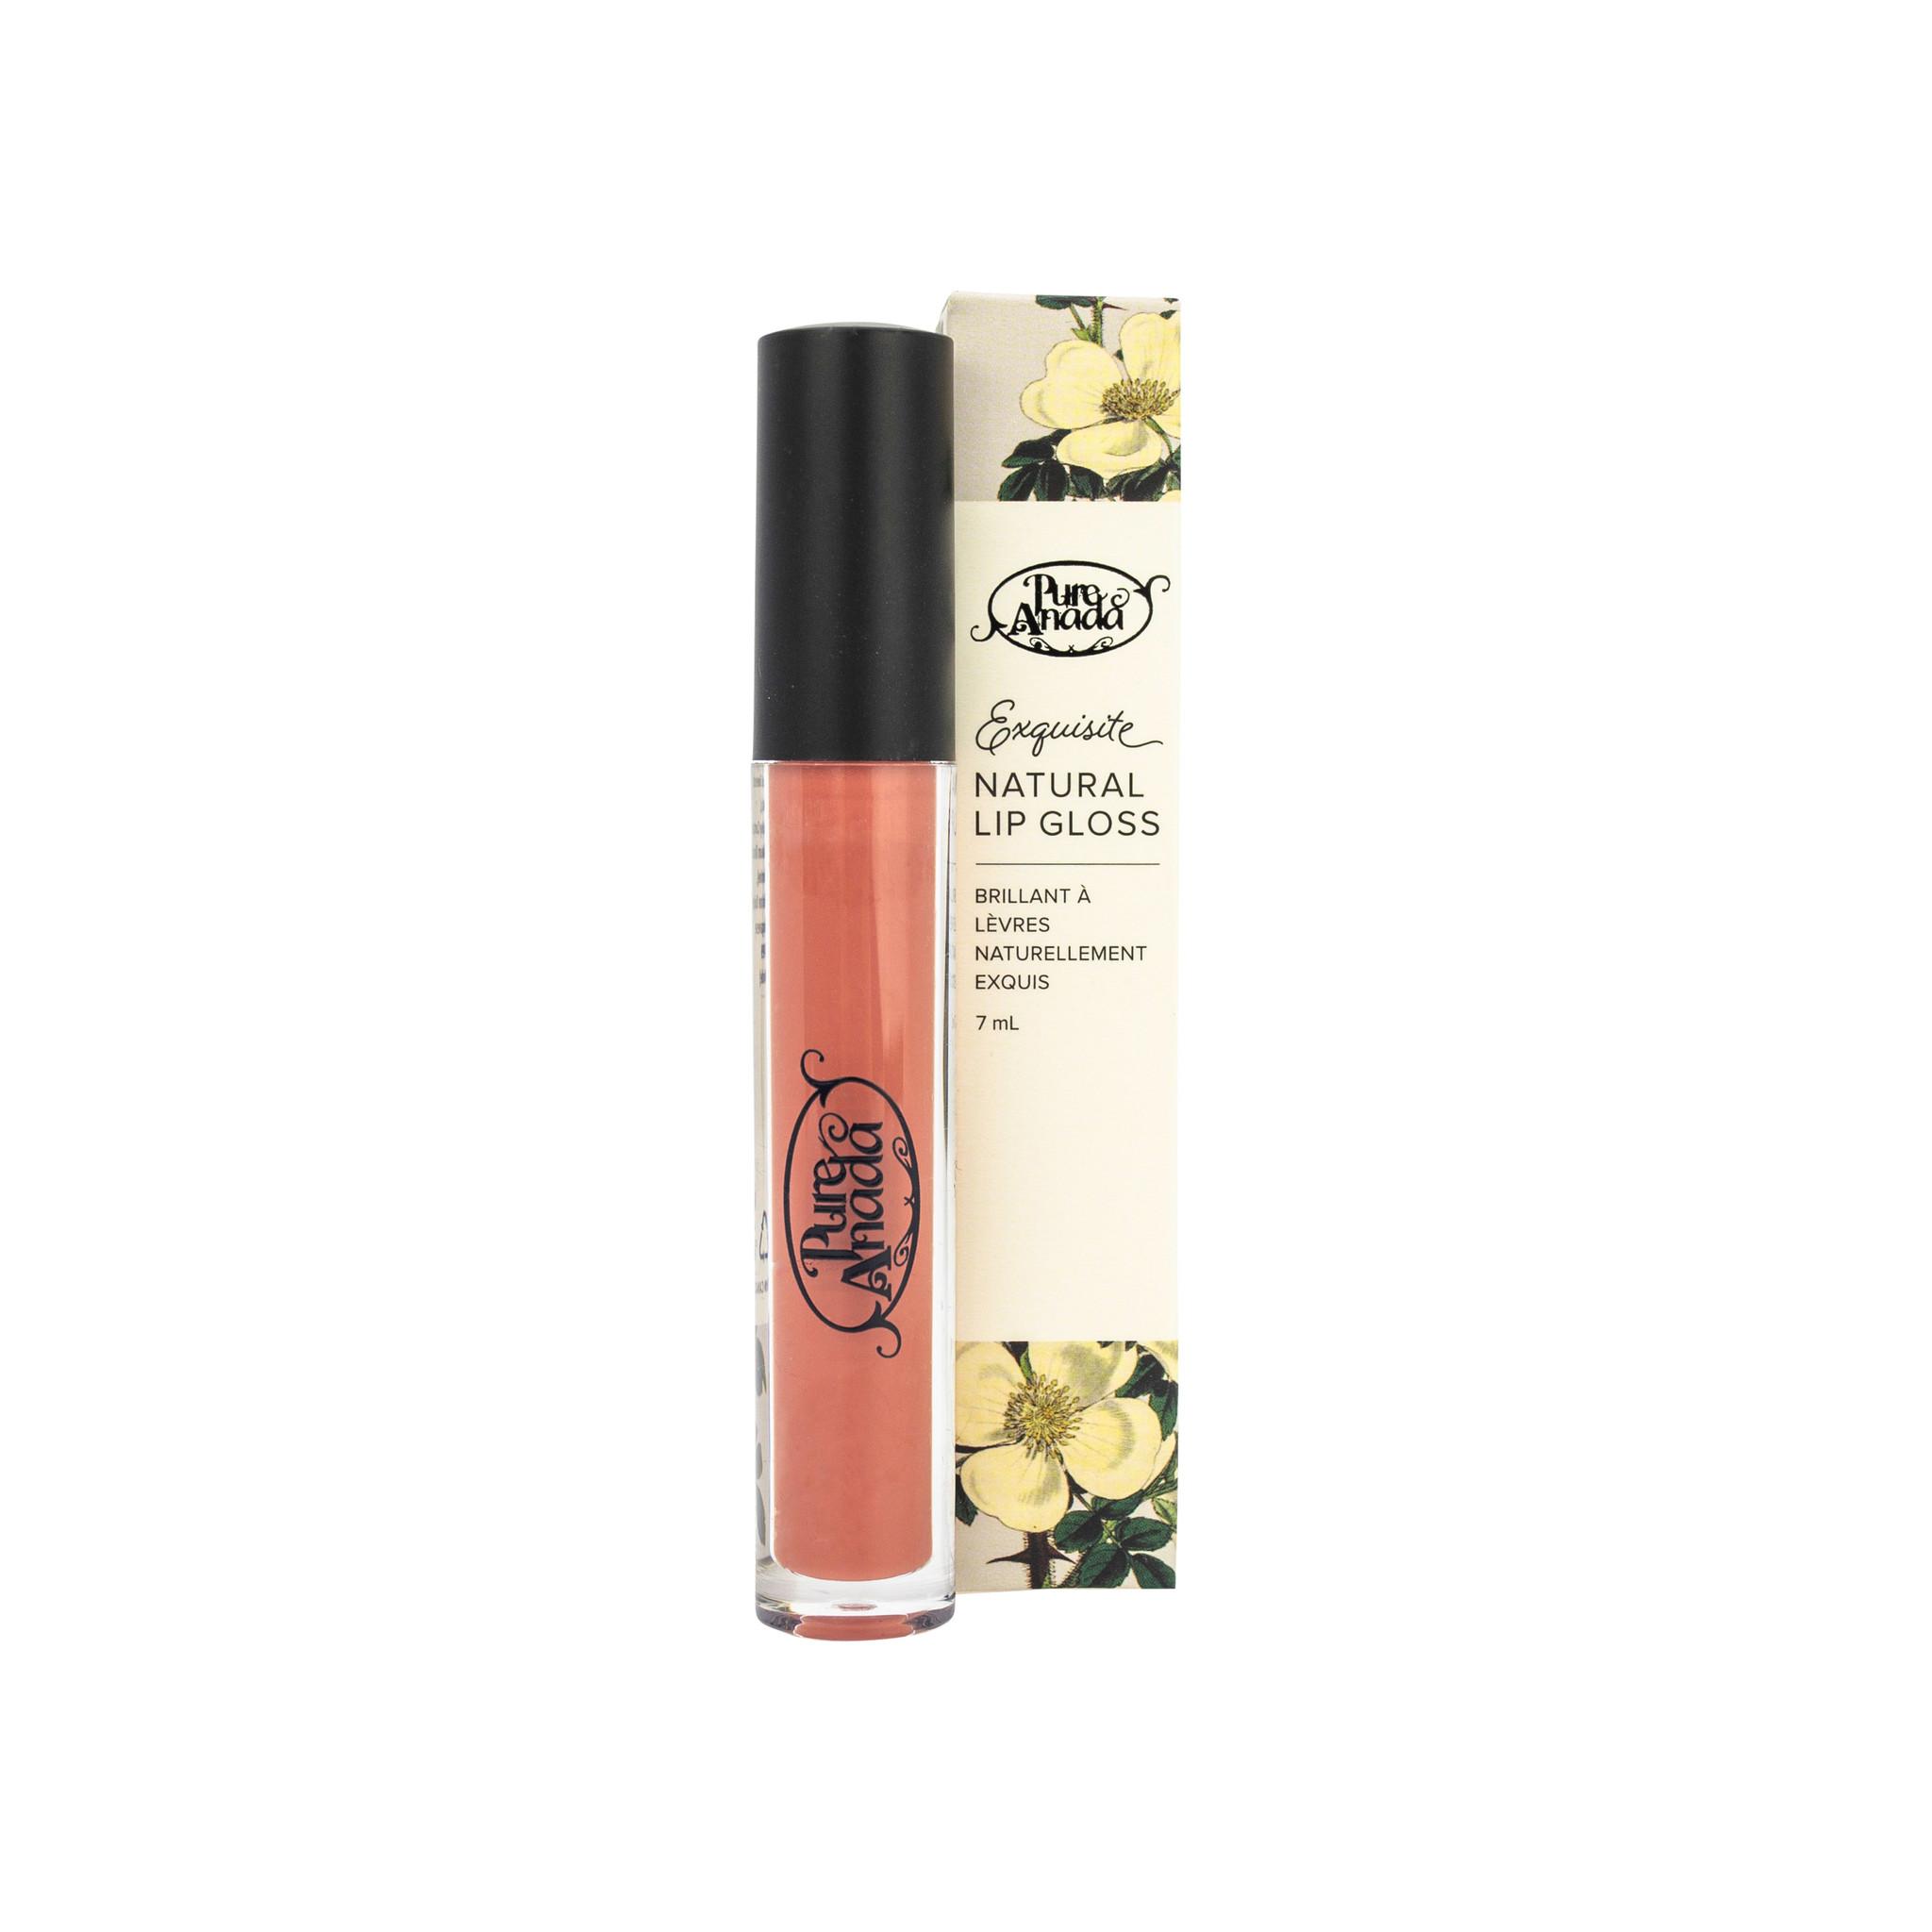 Exquisite Natural Lip Gloss - Peach (Matte)-1